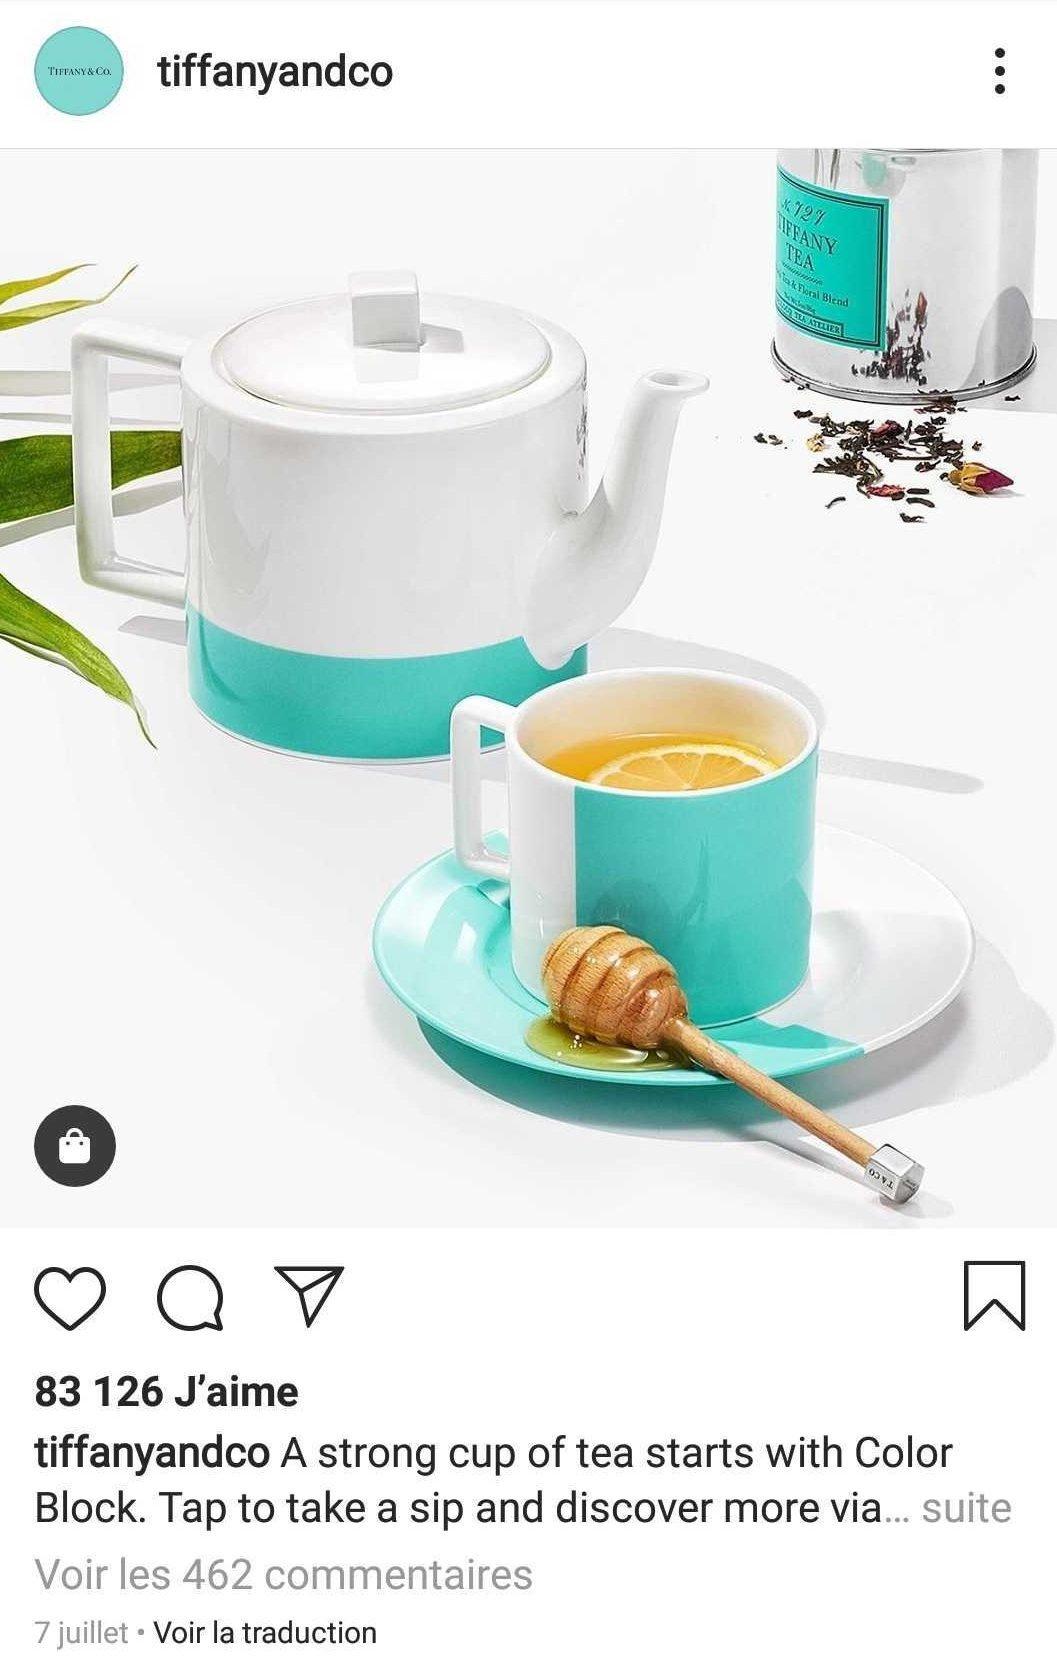 Tiffany & Co Instagram account